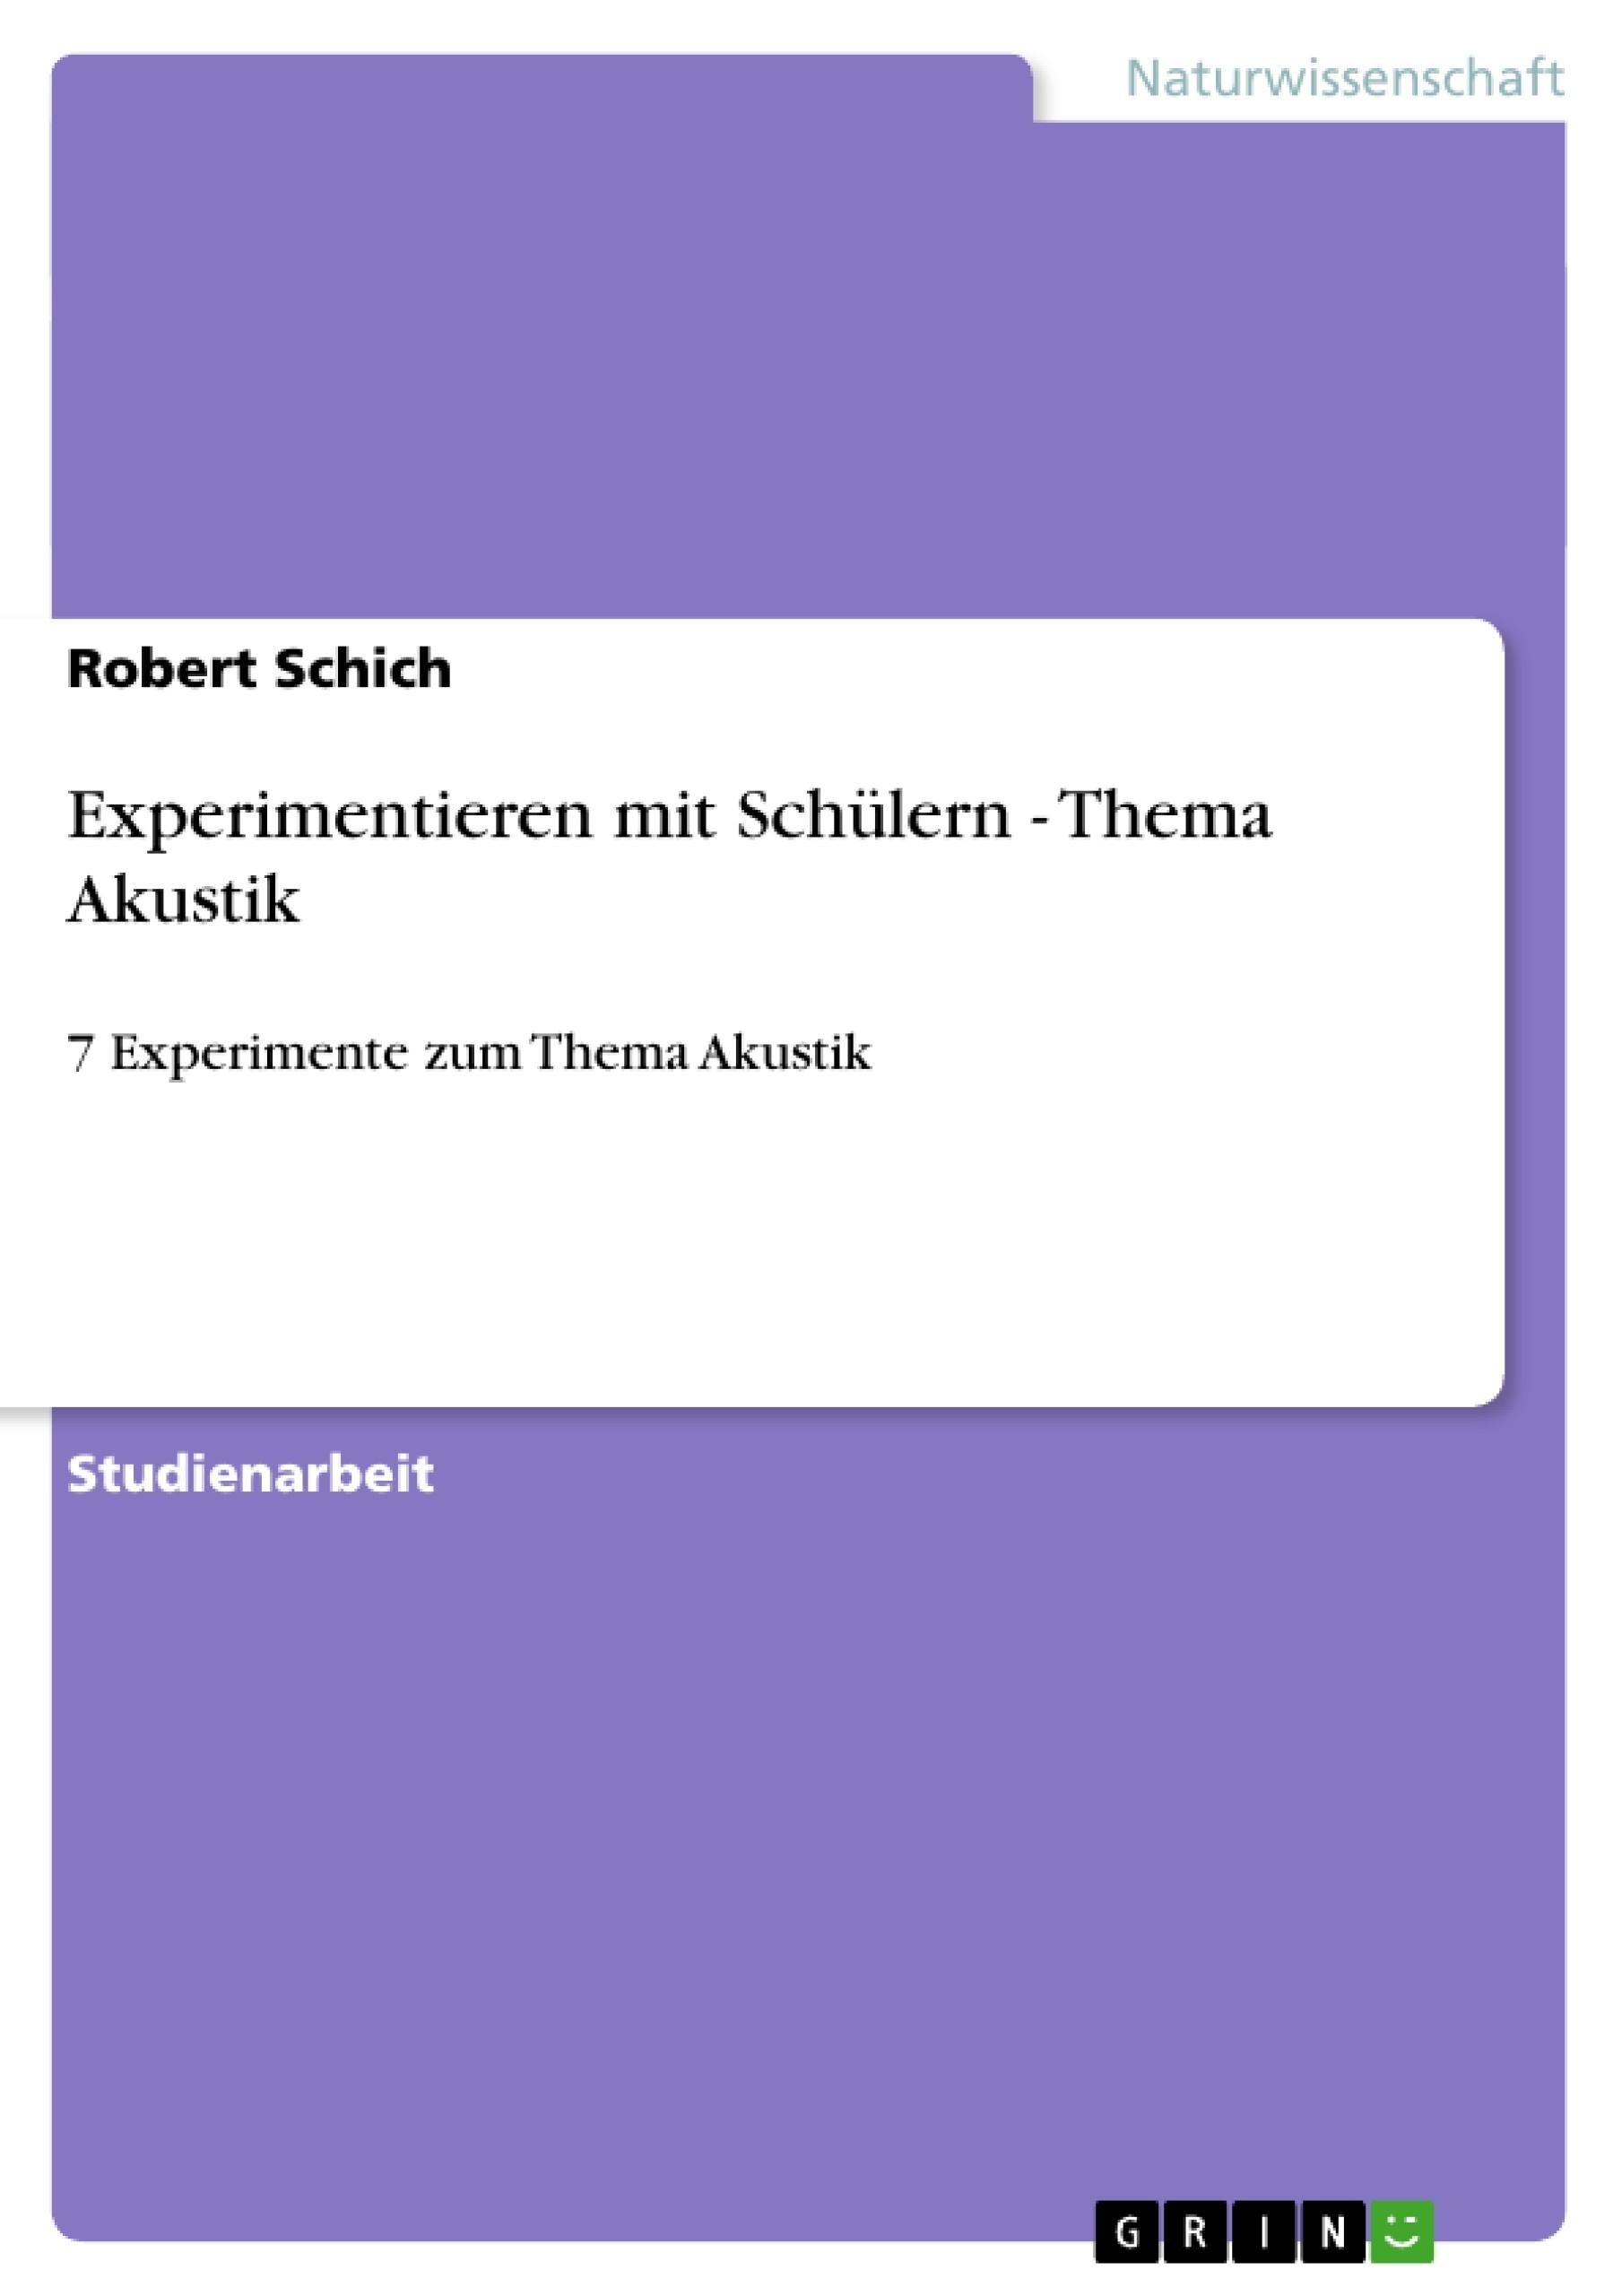 Titel: Experimentieren mit Schülern - Thema Akustik